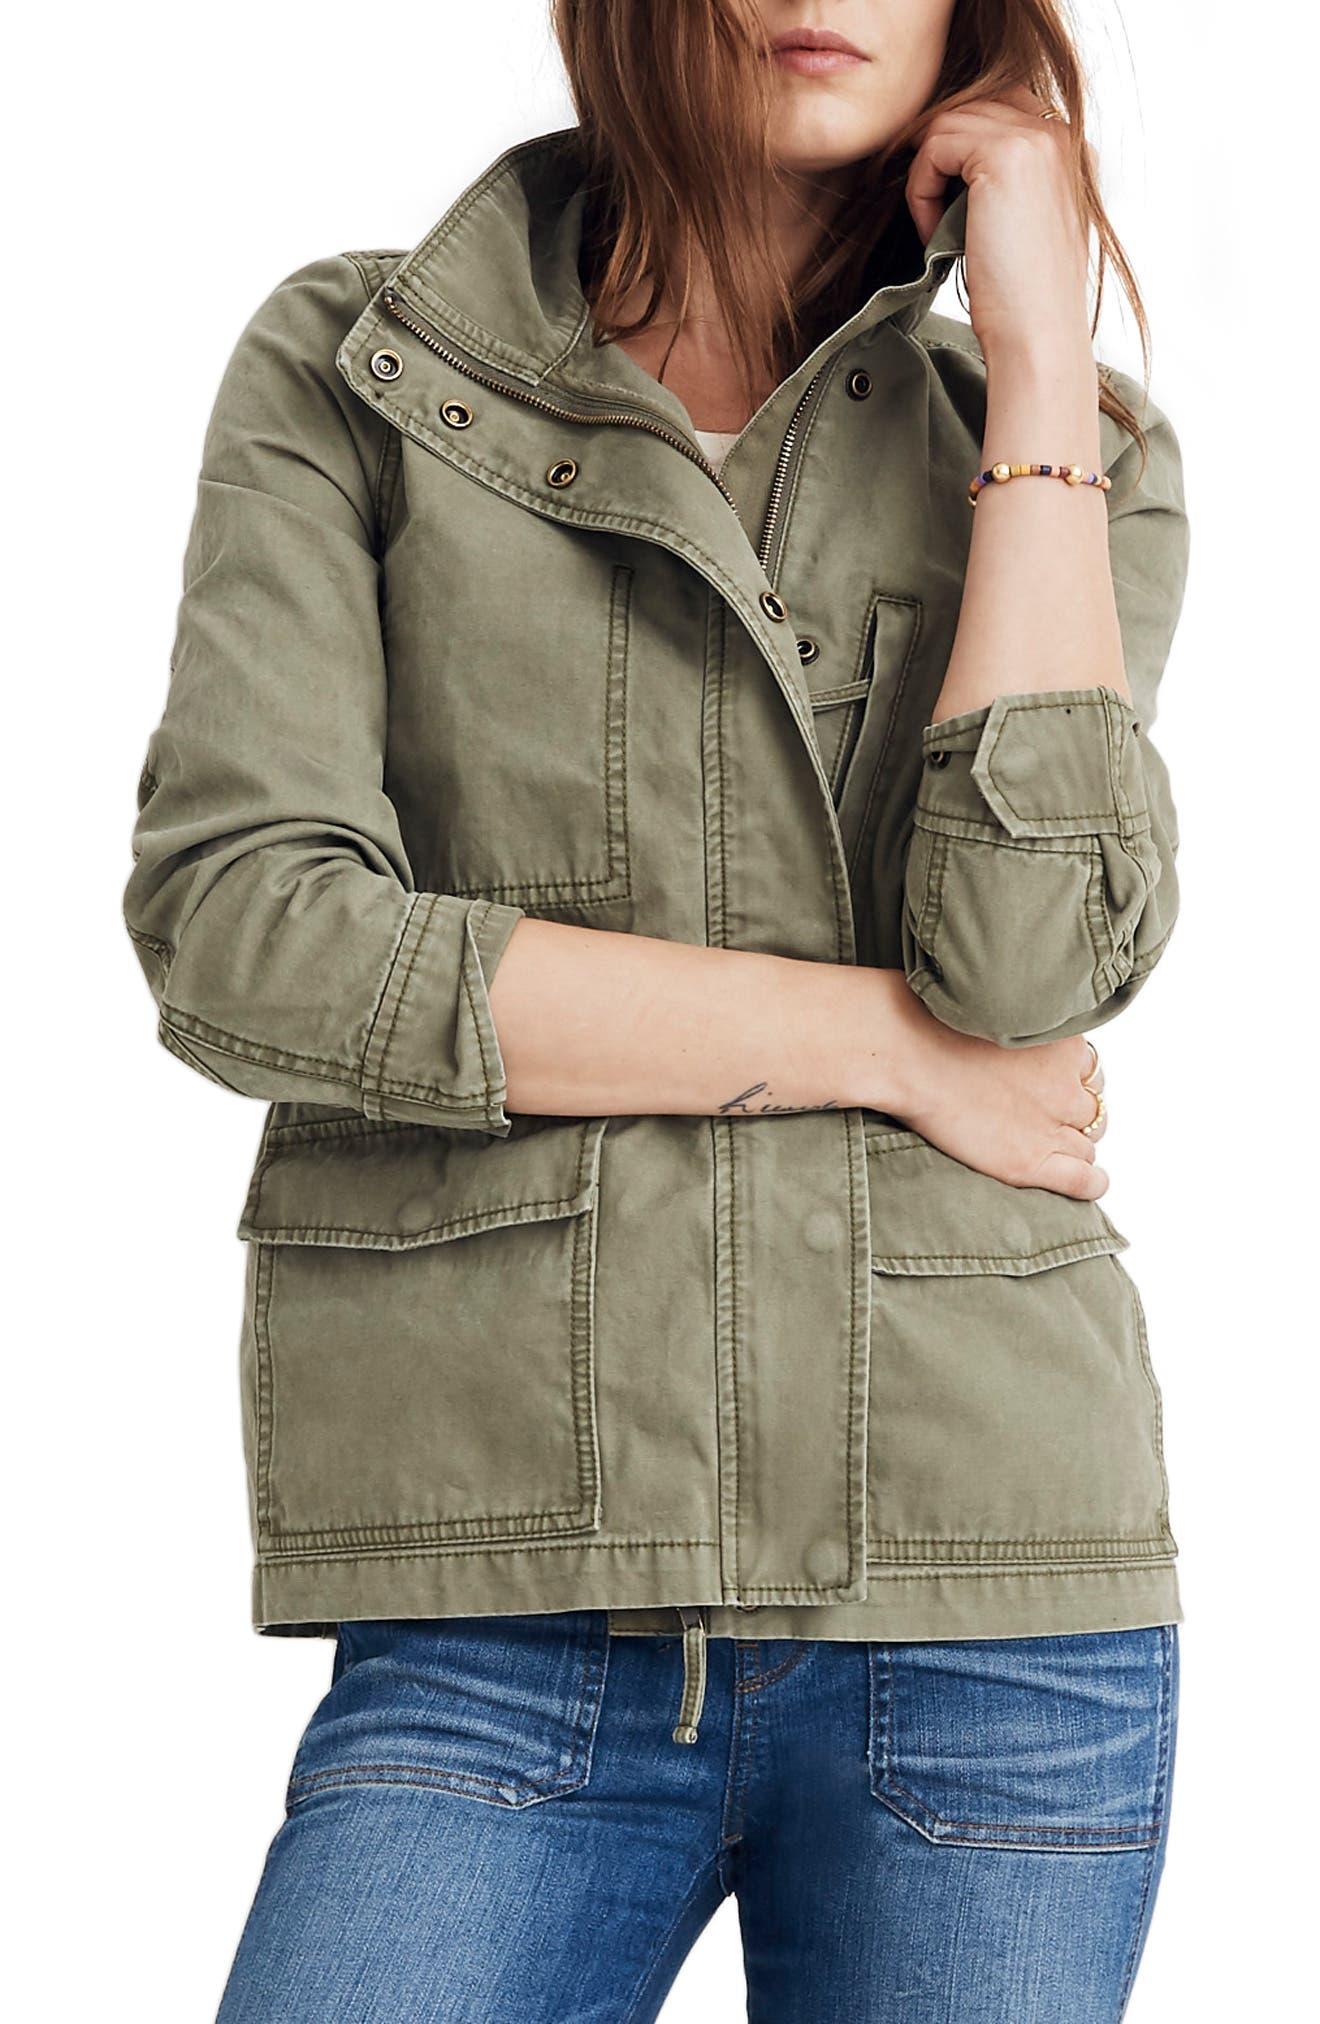 MADEWELL, Surplus Cotton Jacket, Main thumbnail 1, color, DESERT OLIVE